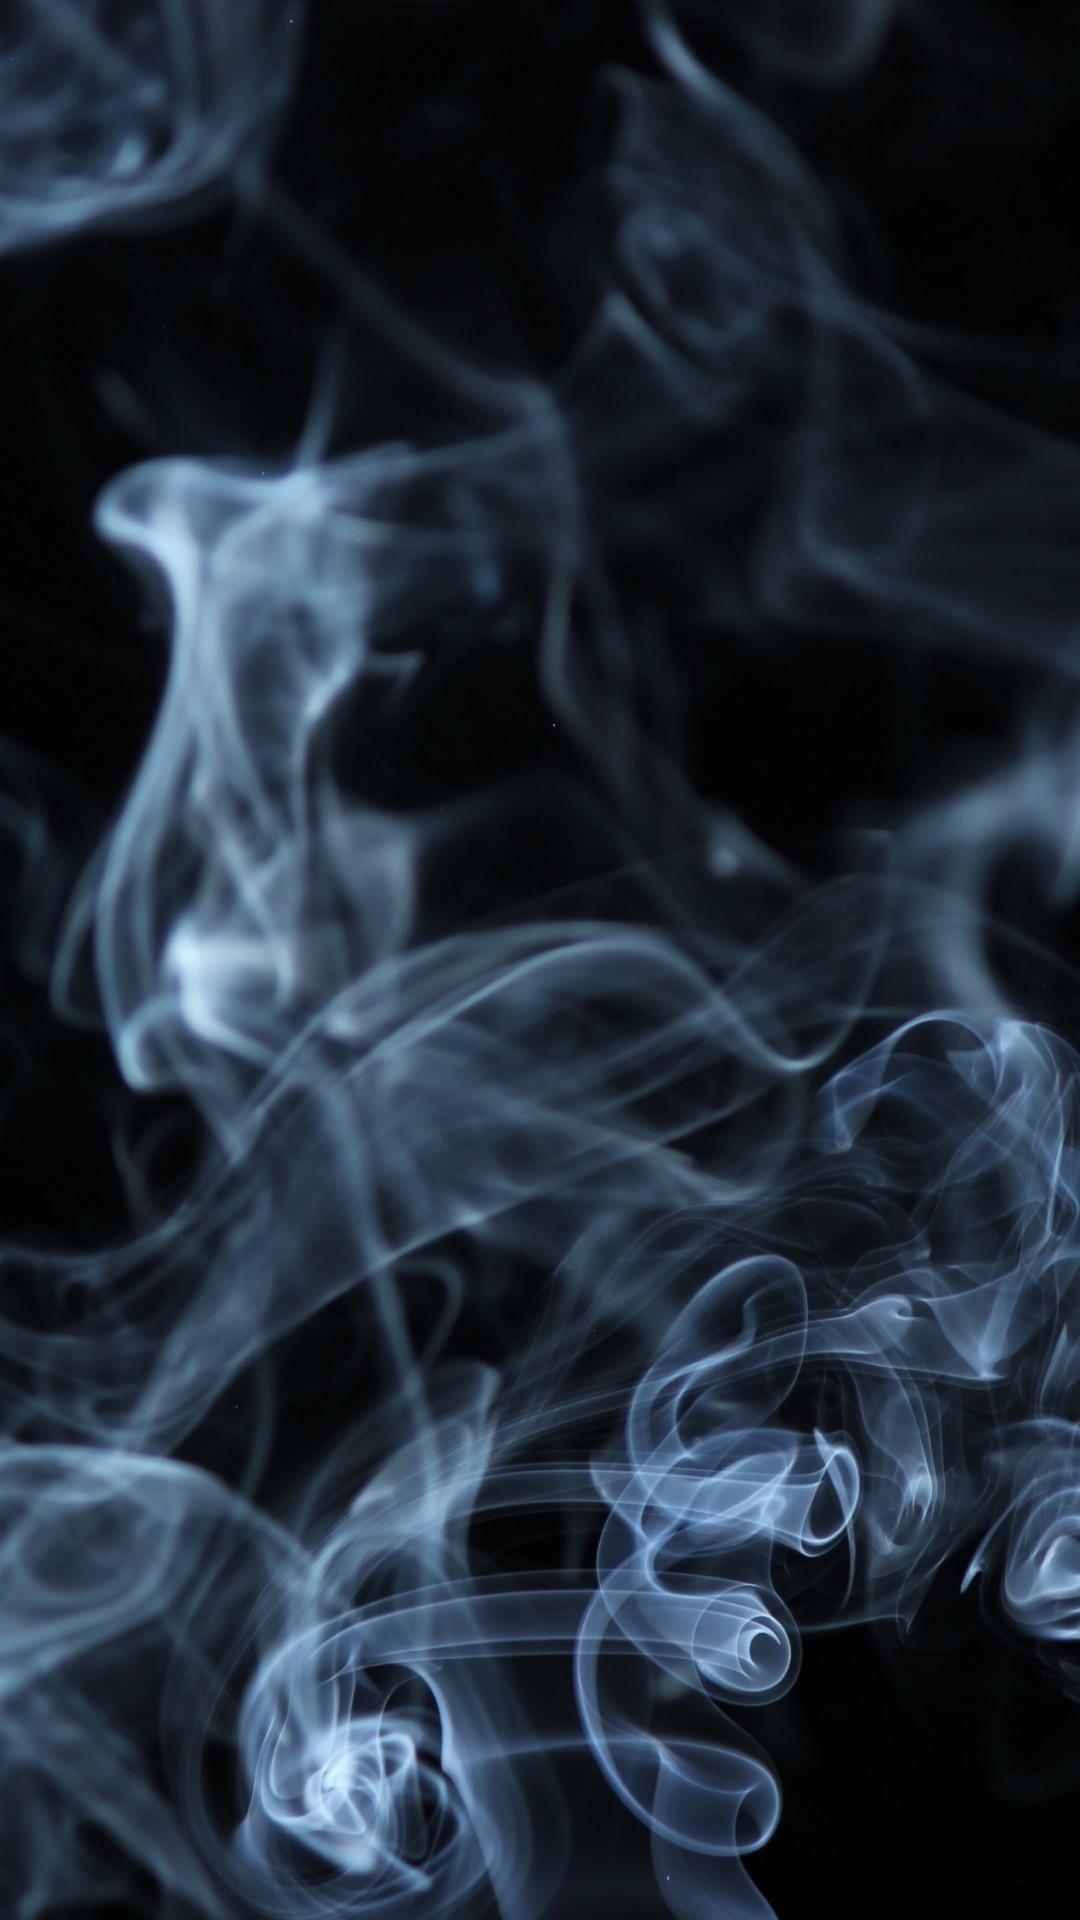 4K HD Wallpaper 2: Smoke on Black Background